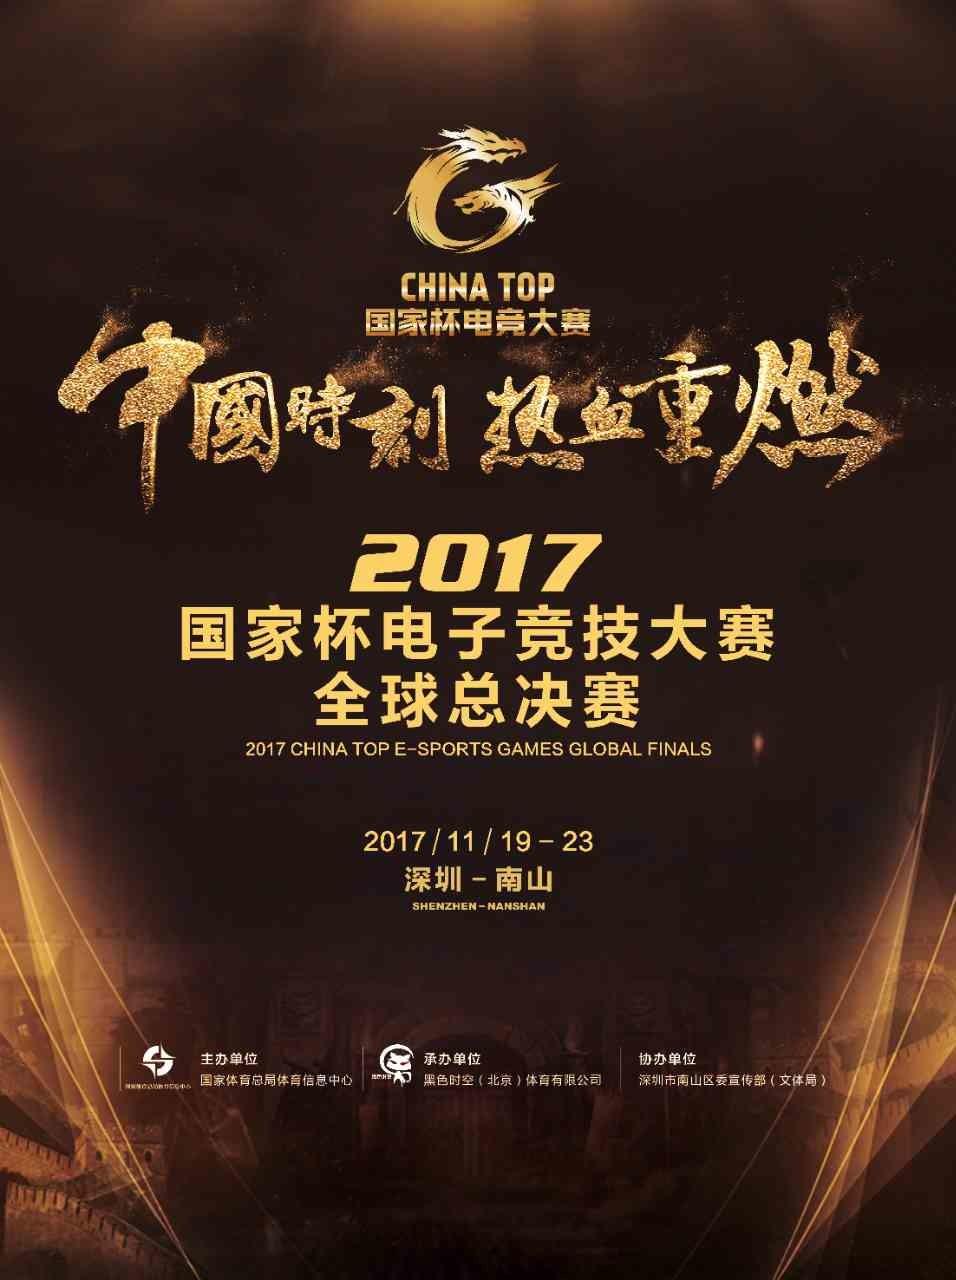 2017 CHINA TOP国家杯电子竞技大赛全球总决赛